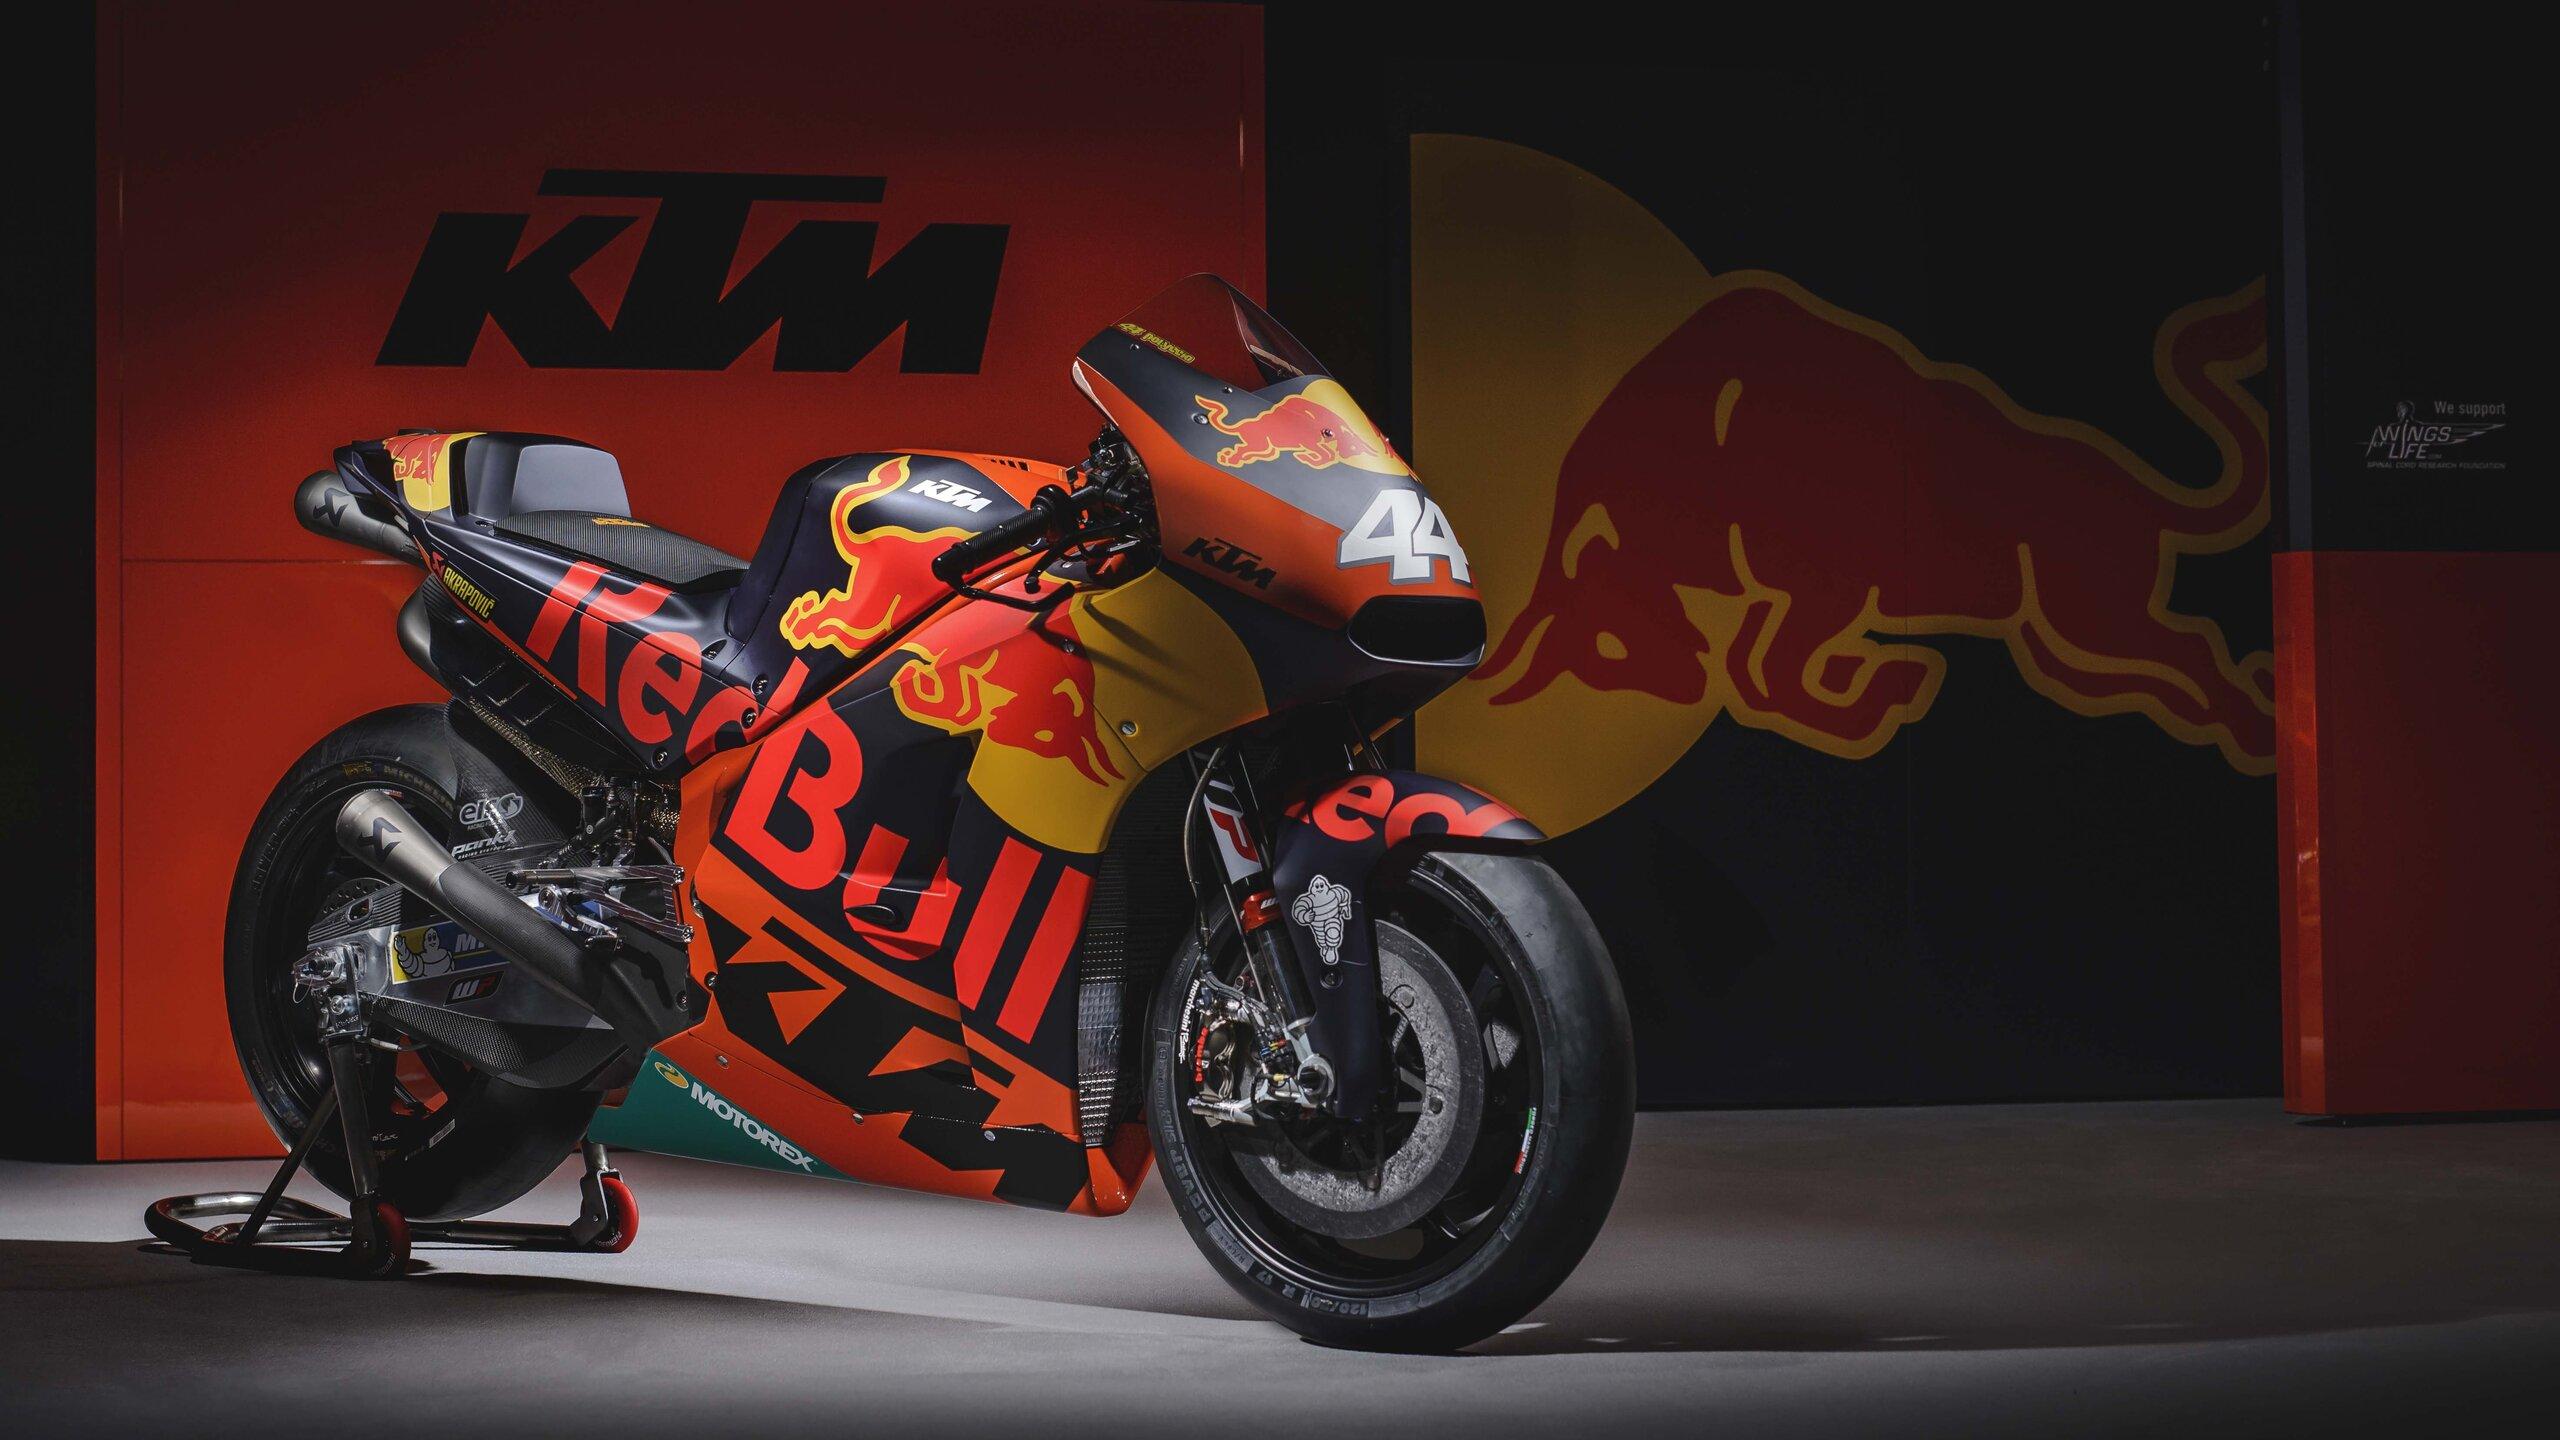 ktm-rc16-motogp-bike-ox.jpg